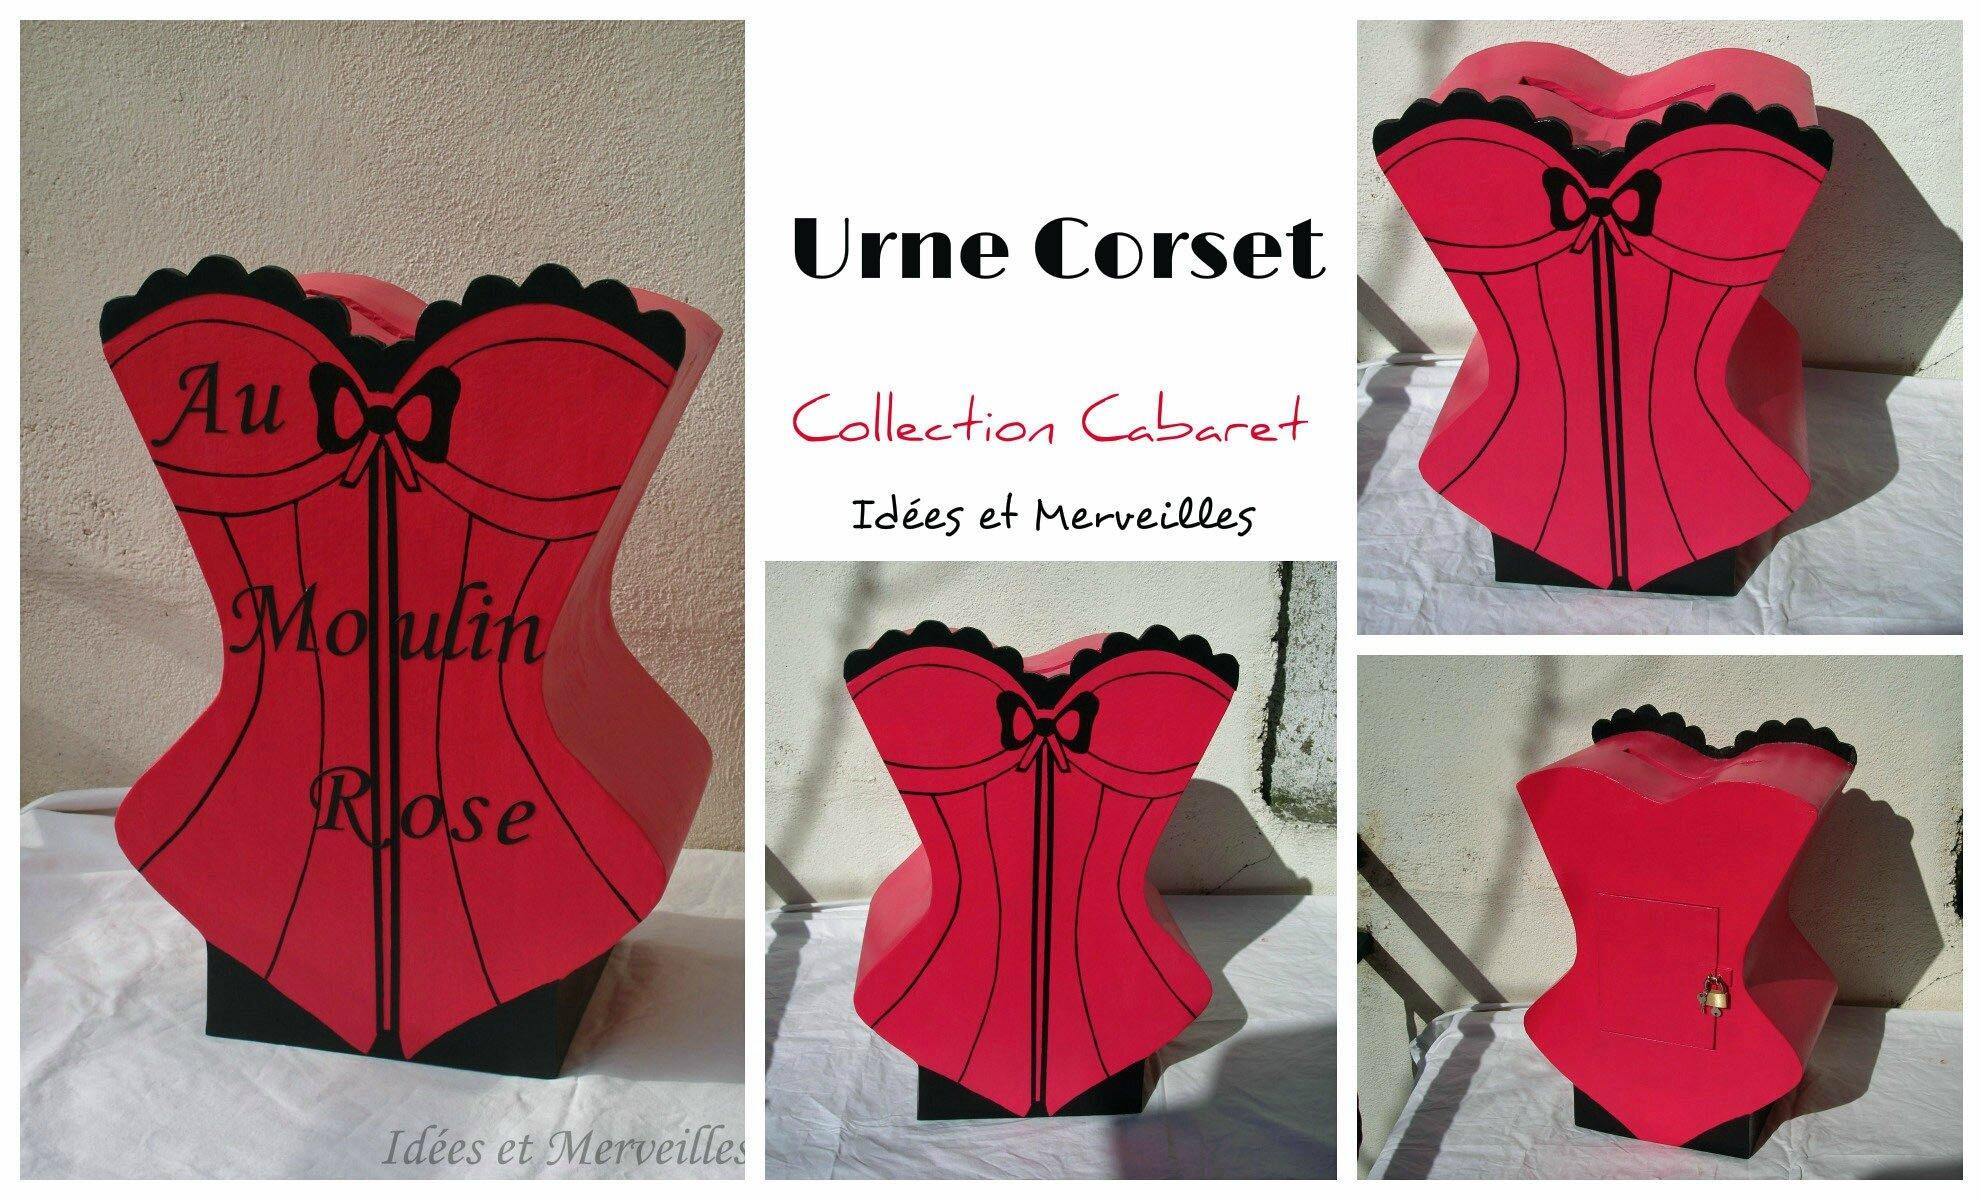 urne corset theme cabaret - idees et merveilles 6